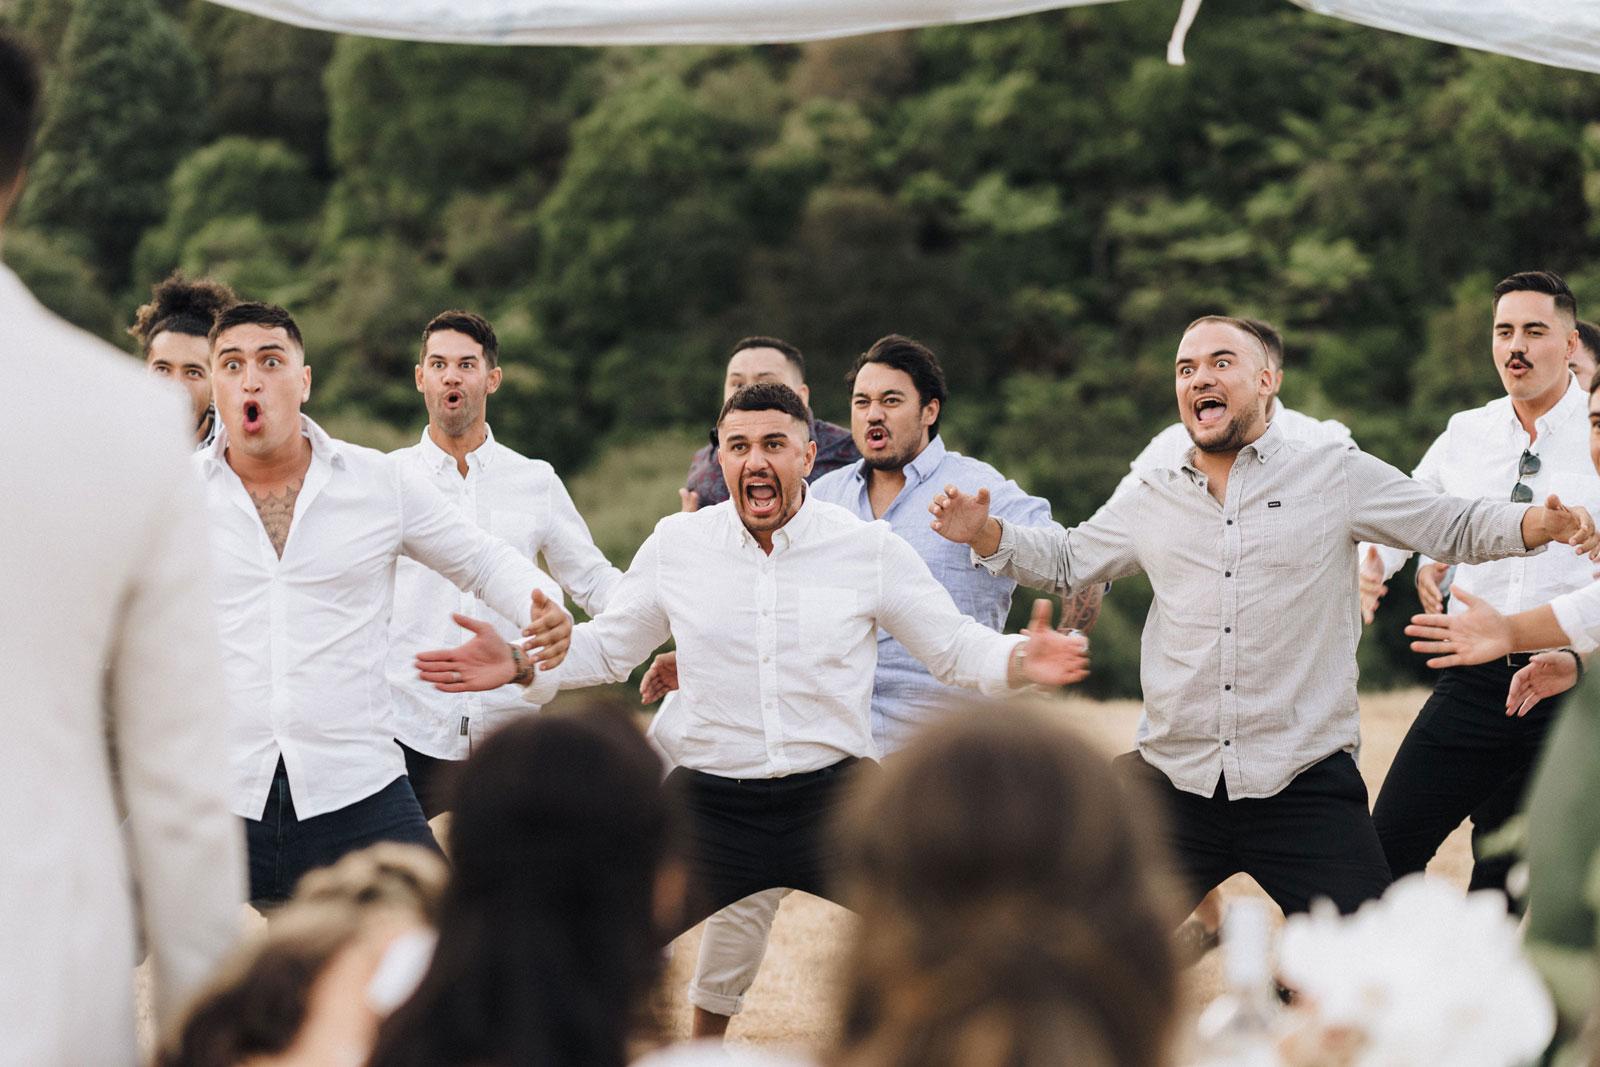 newfound-s-t-hunua-auckland-wedding-photographers-088